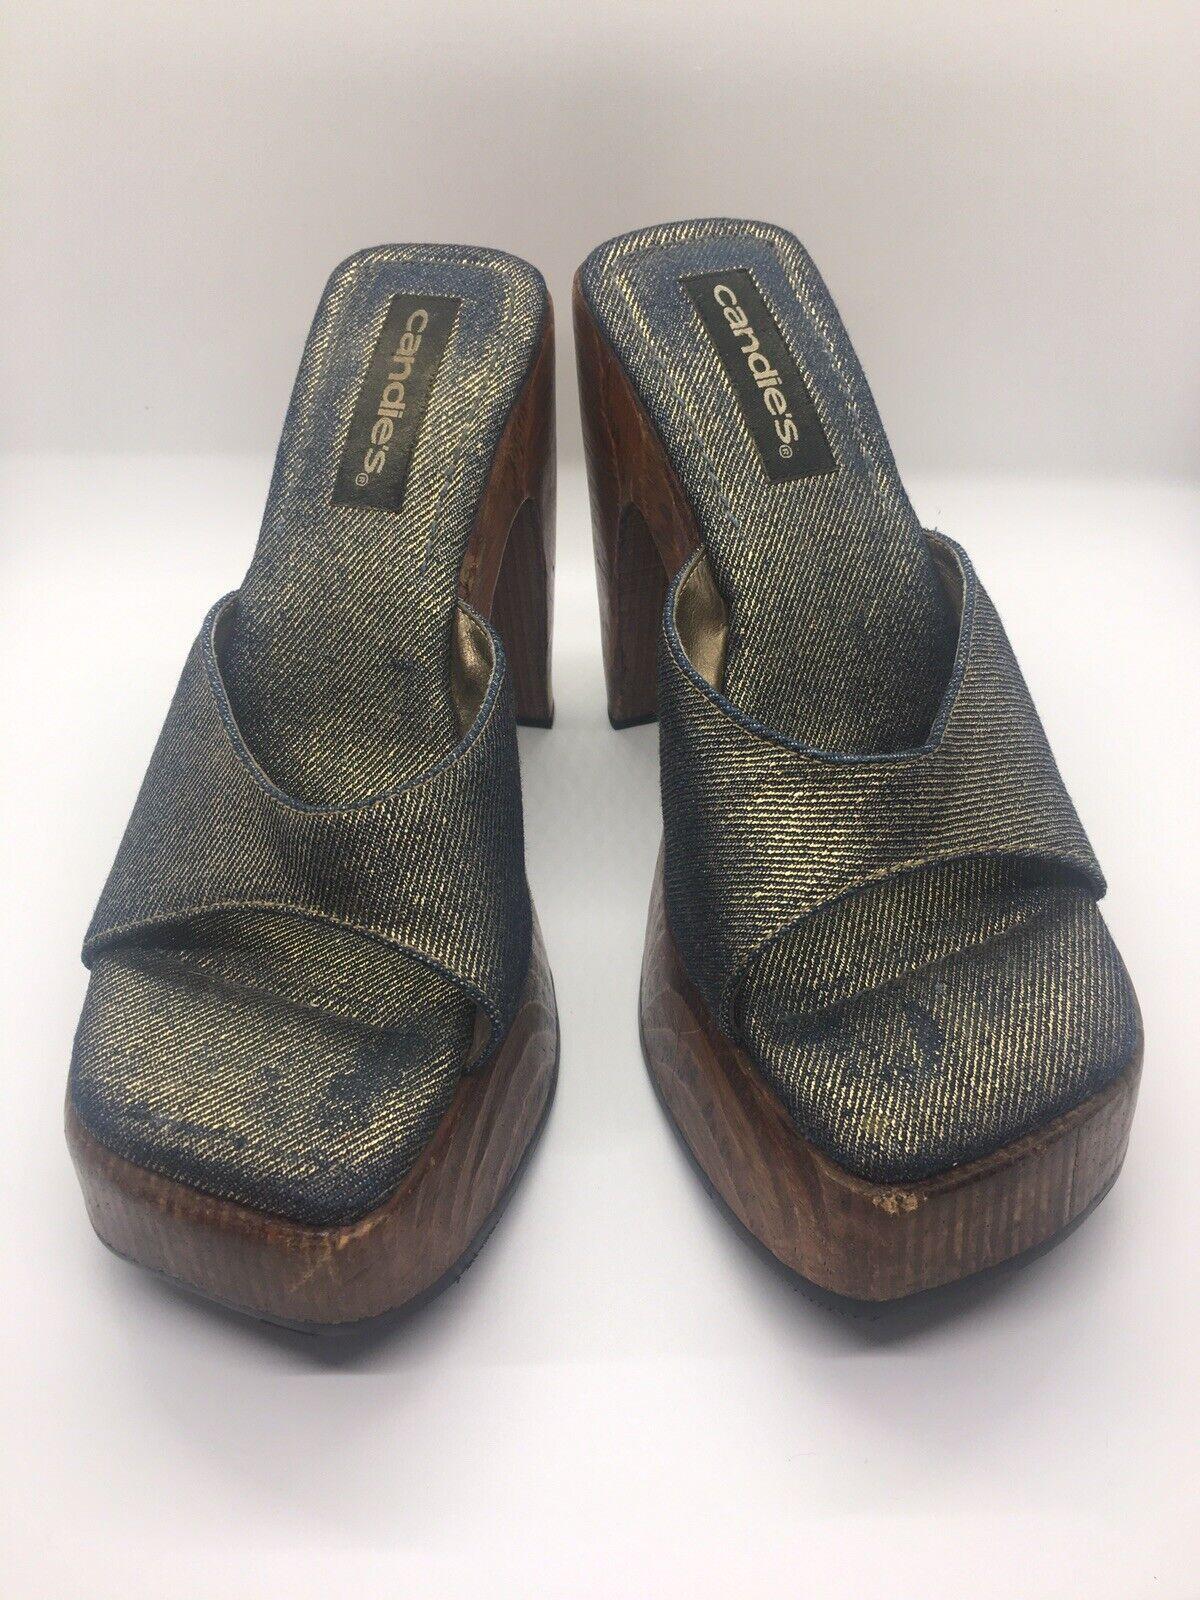 CANDIE'S Vintage 1990's Denim Platform Block Heel… - image 7